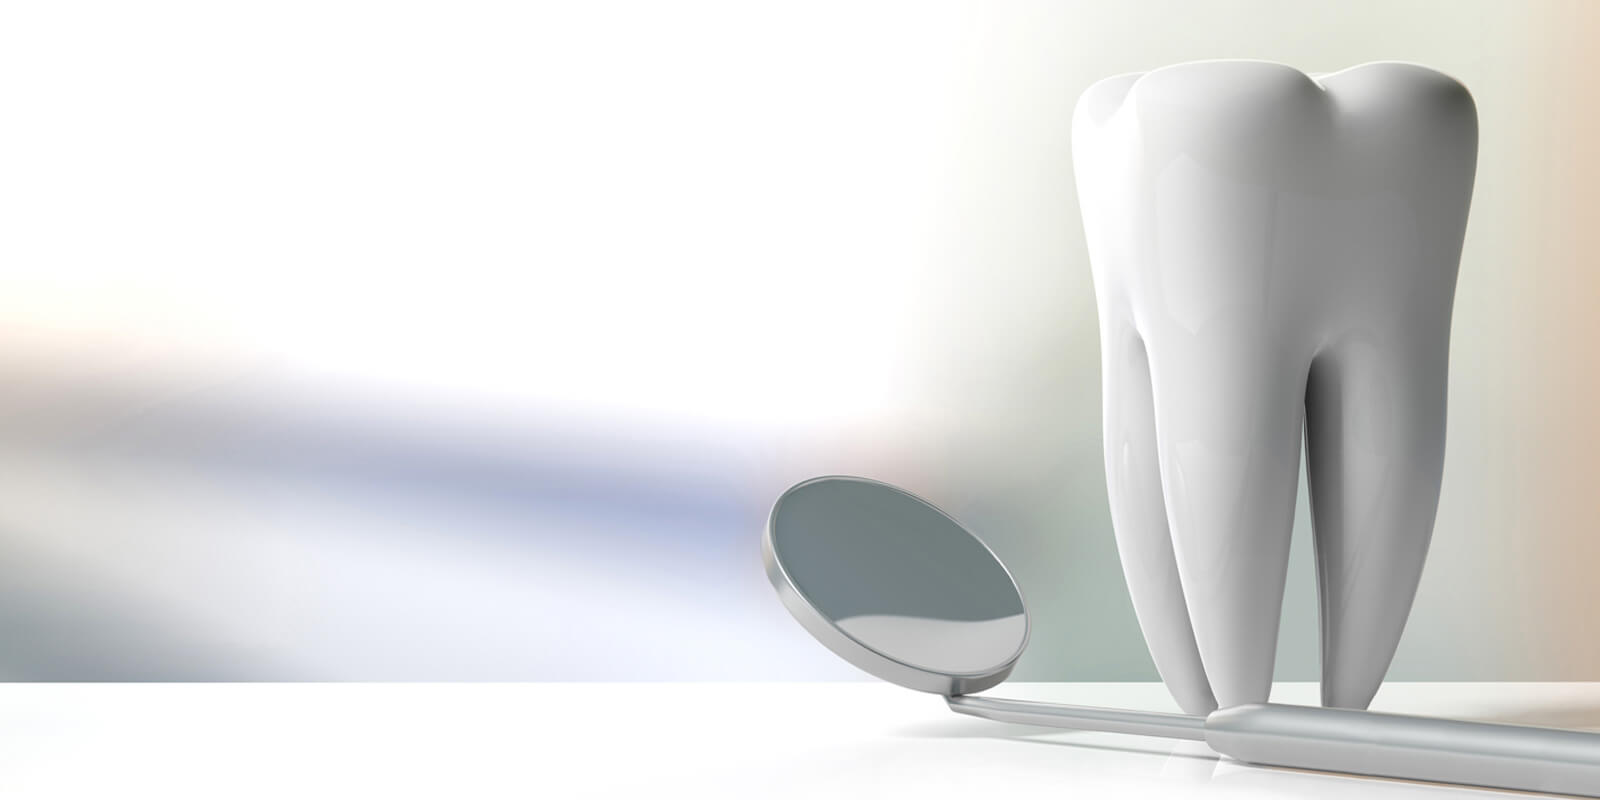 Zahnarzt Dr Lentz gesunde Zähne | Heidelberg